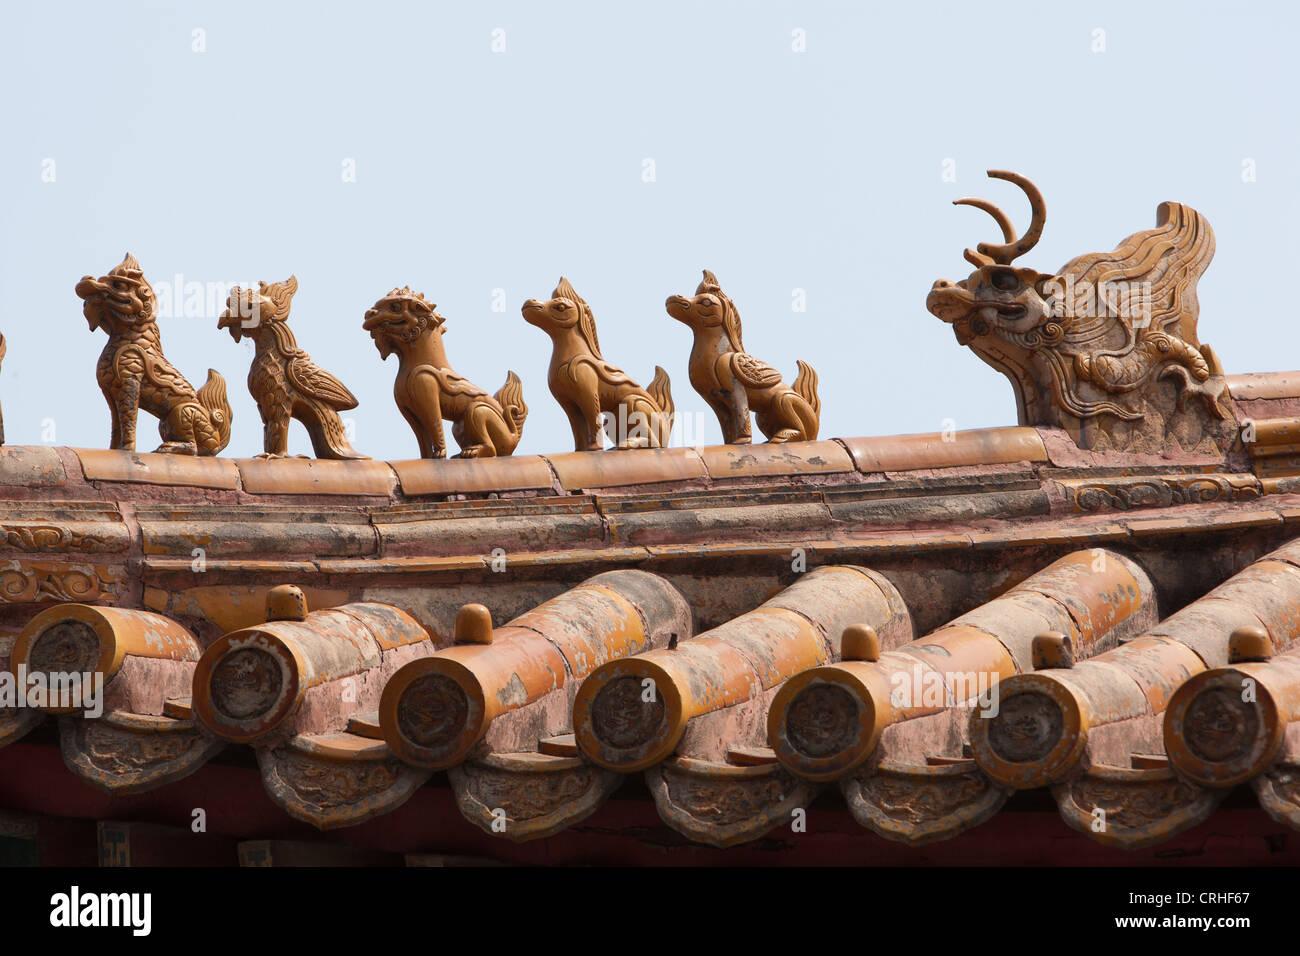 Lama Temple in Yonghegong Dajie, in Beijing, China - Stock Image